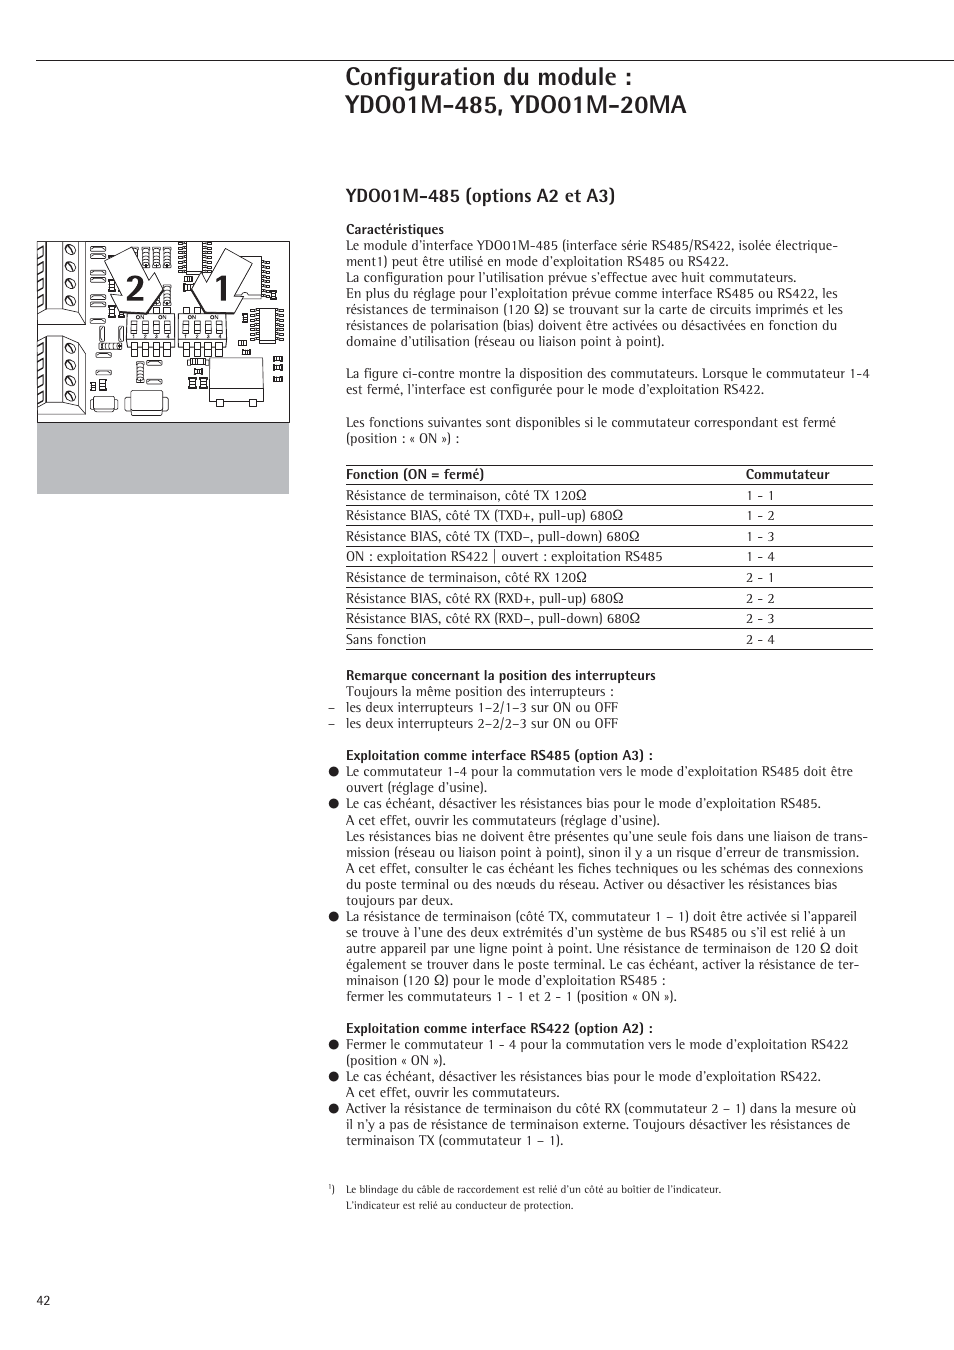 Sartorius midrics 1 manual.